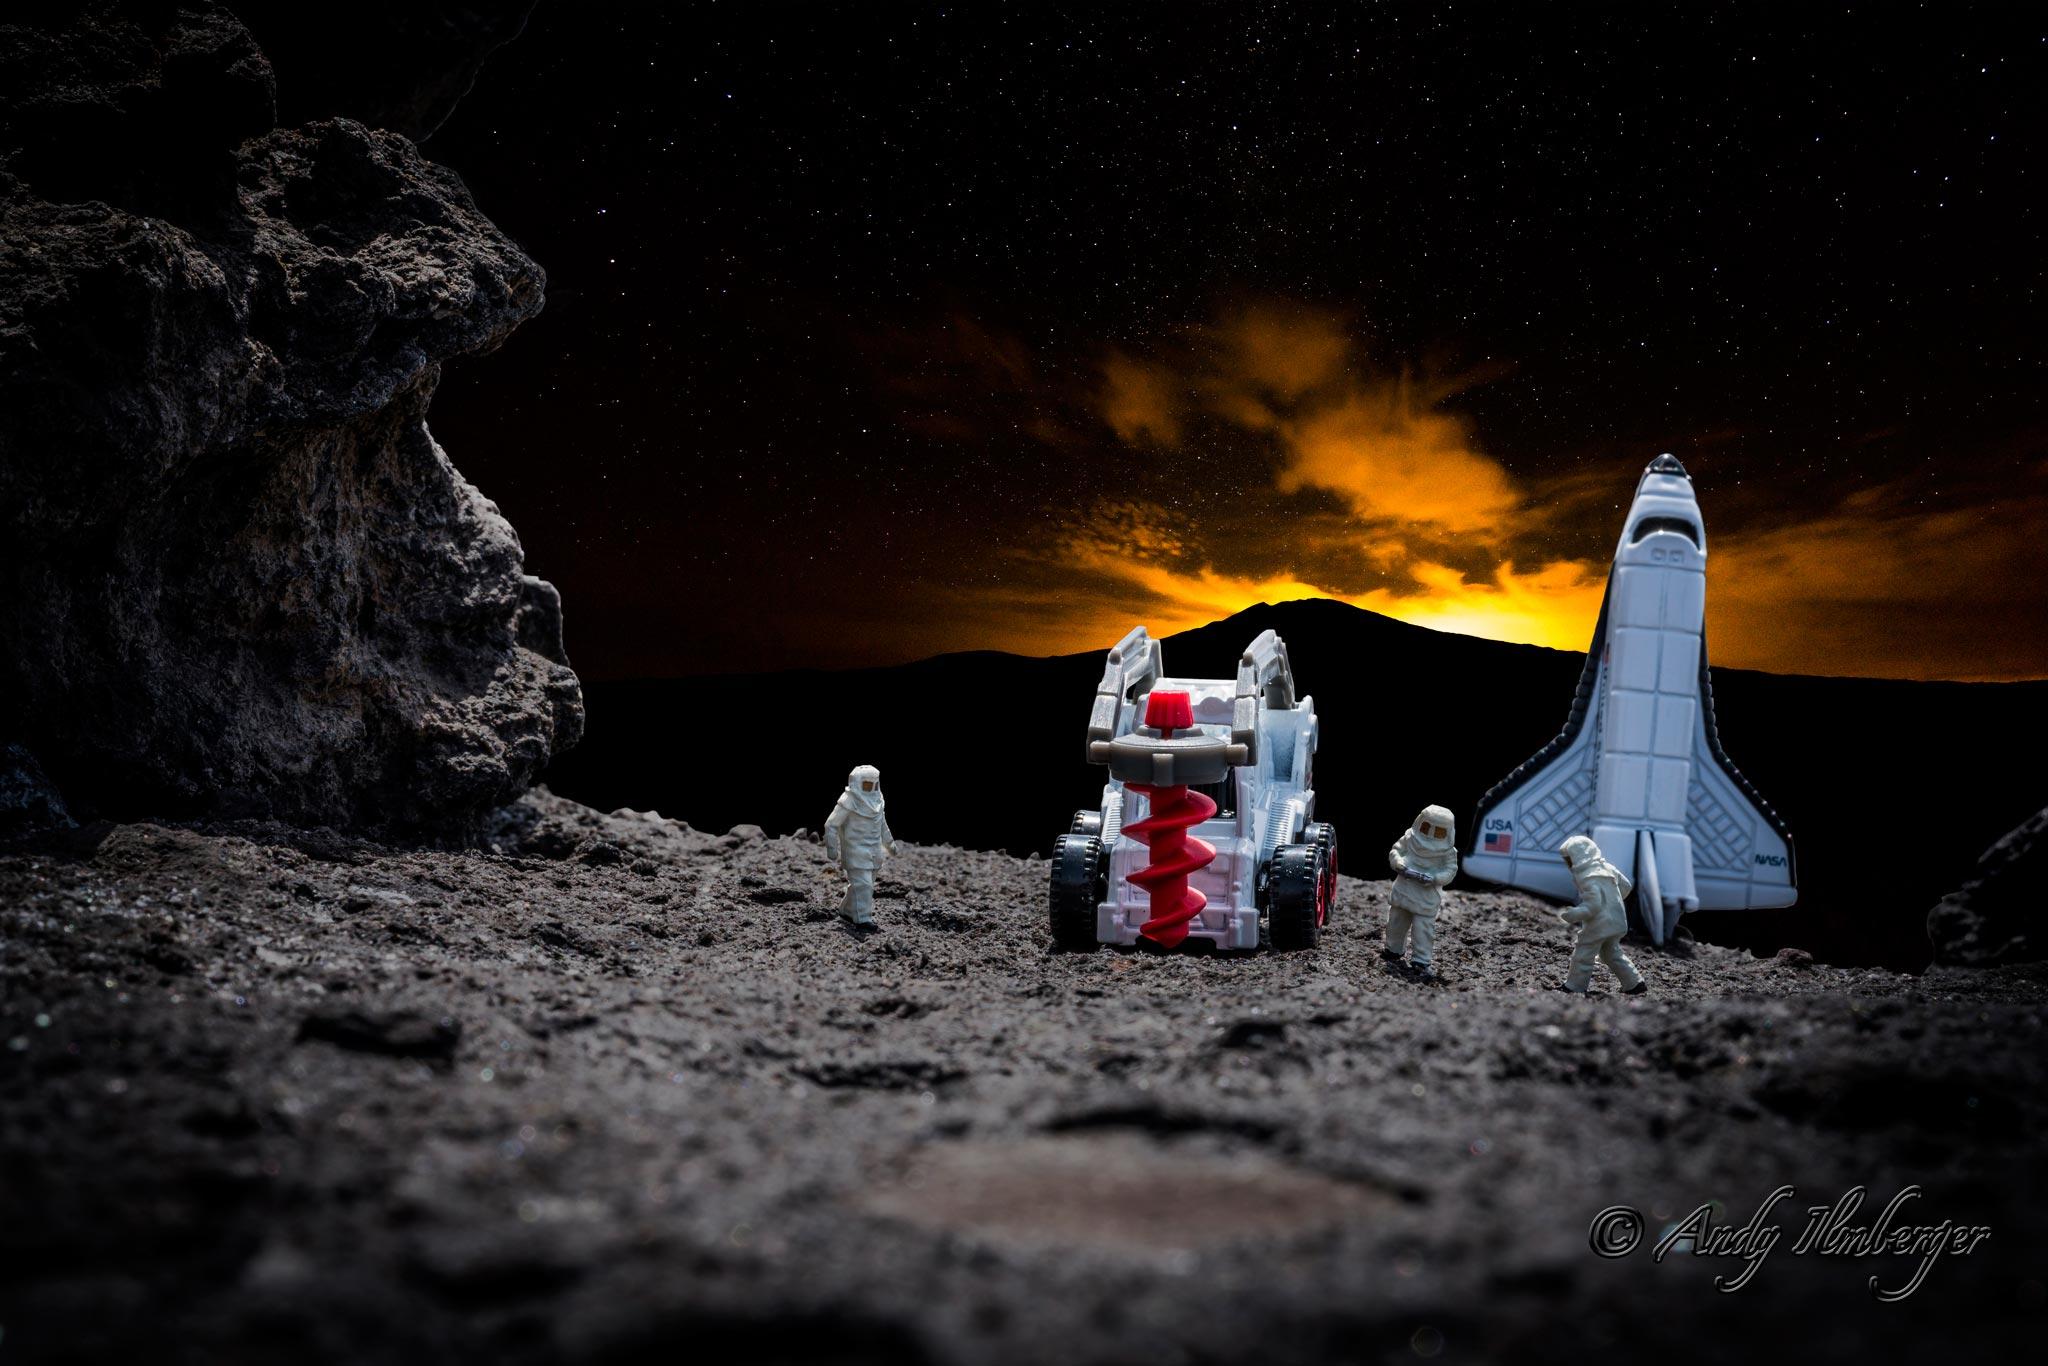 H0-Helden: Marsexpedition (Foto: Andy Ilmberger)